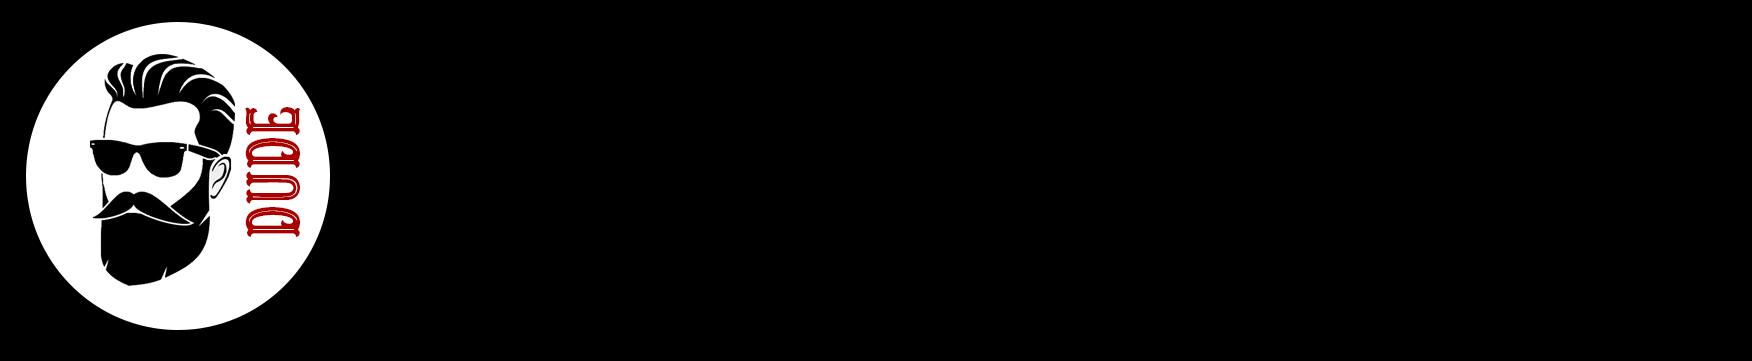 DUDEronomy